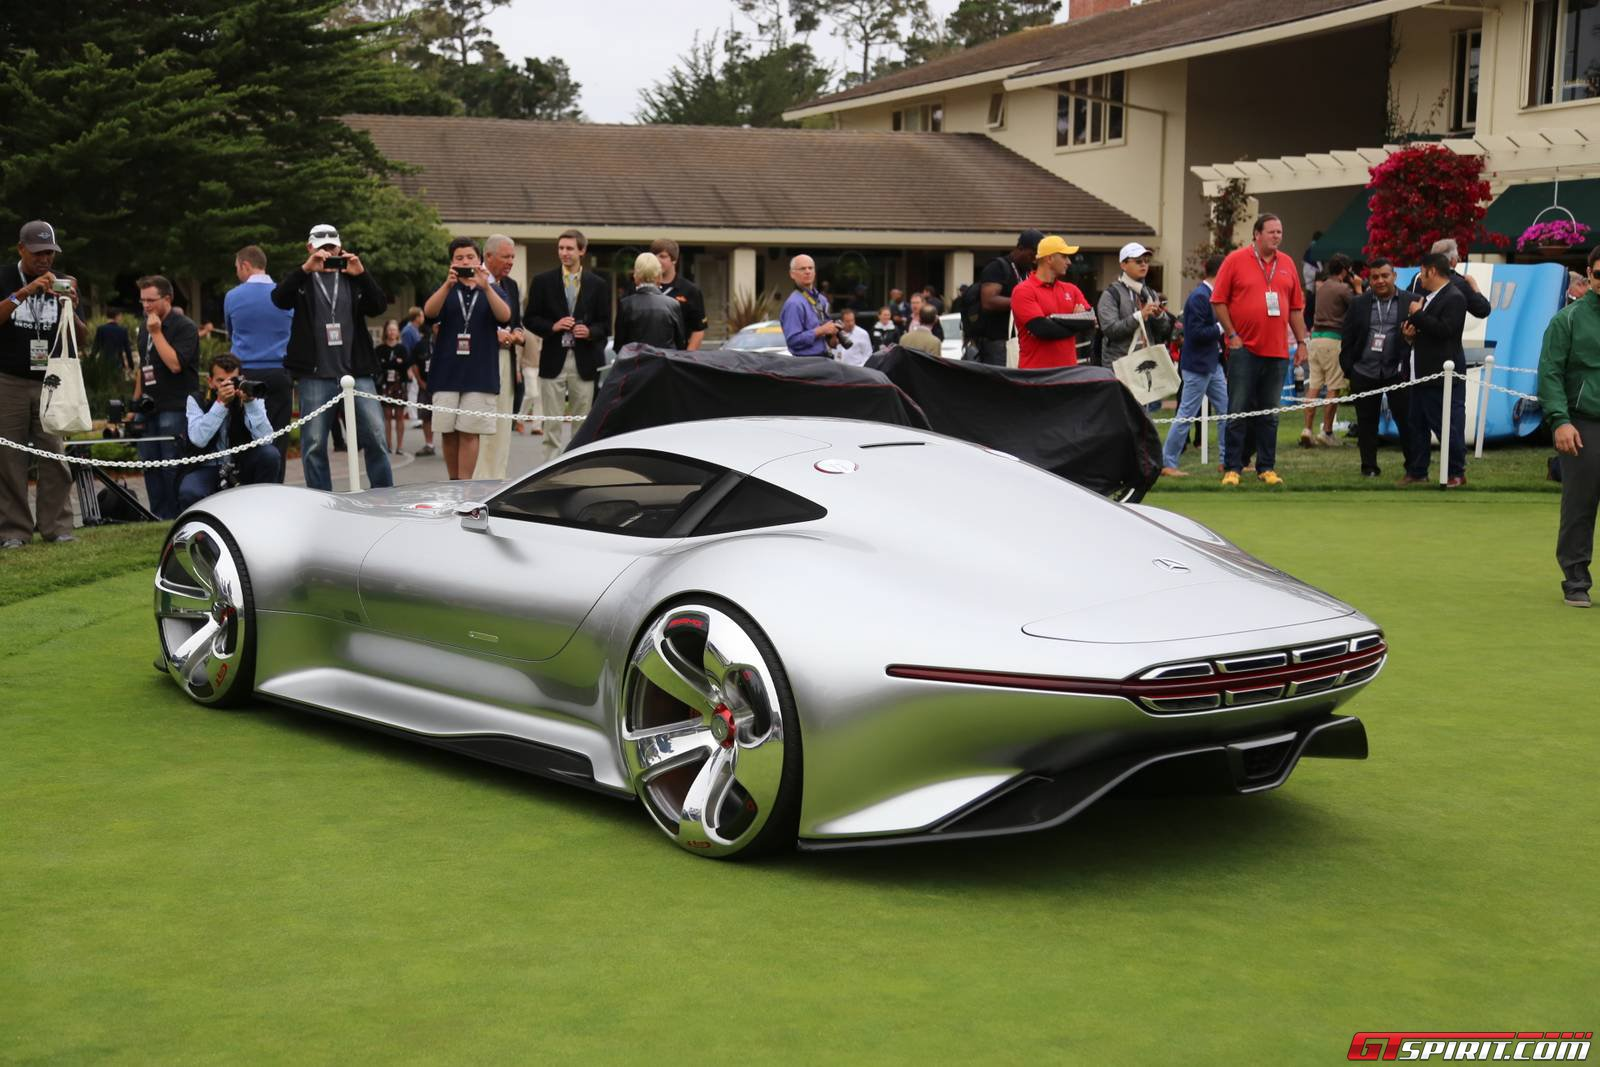 Monterey Concept And Supercar Lawn GTspirit - Monterey car show